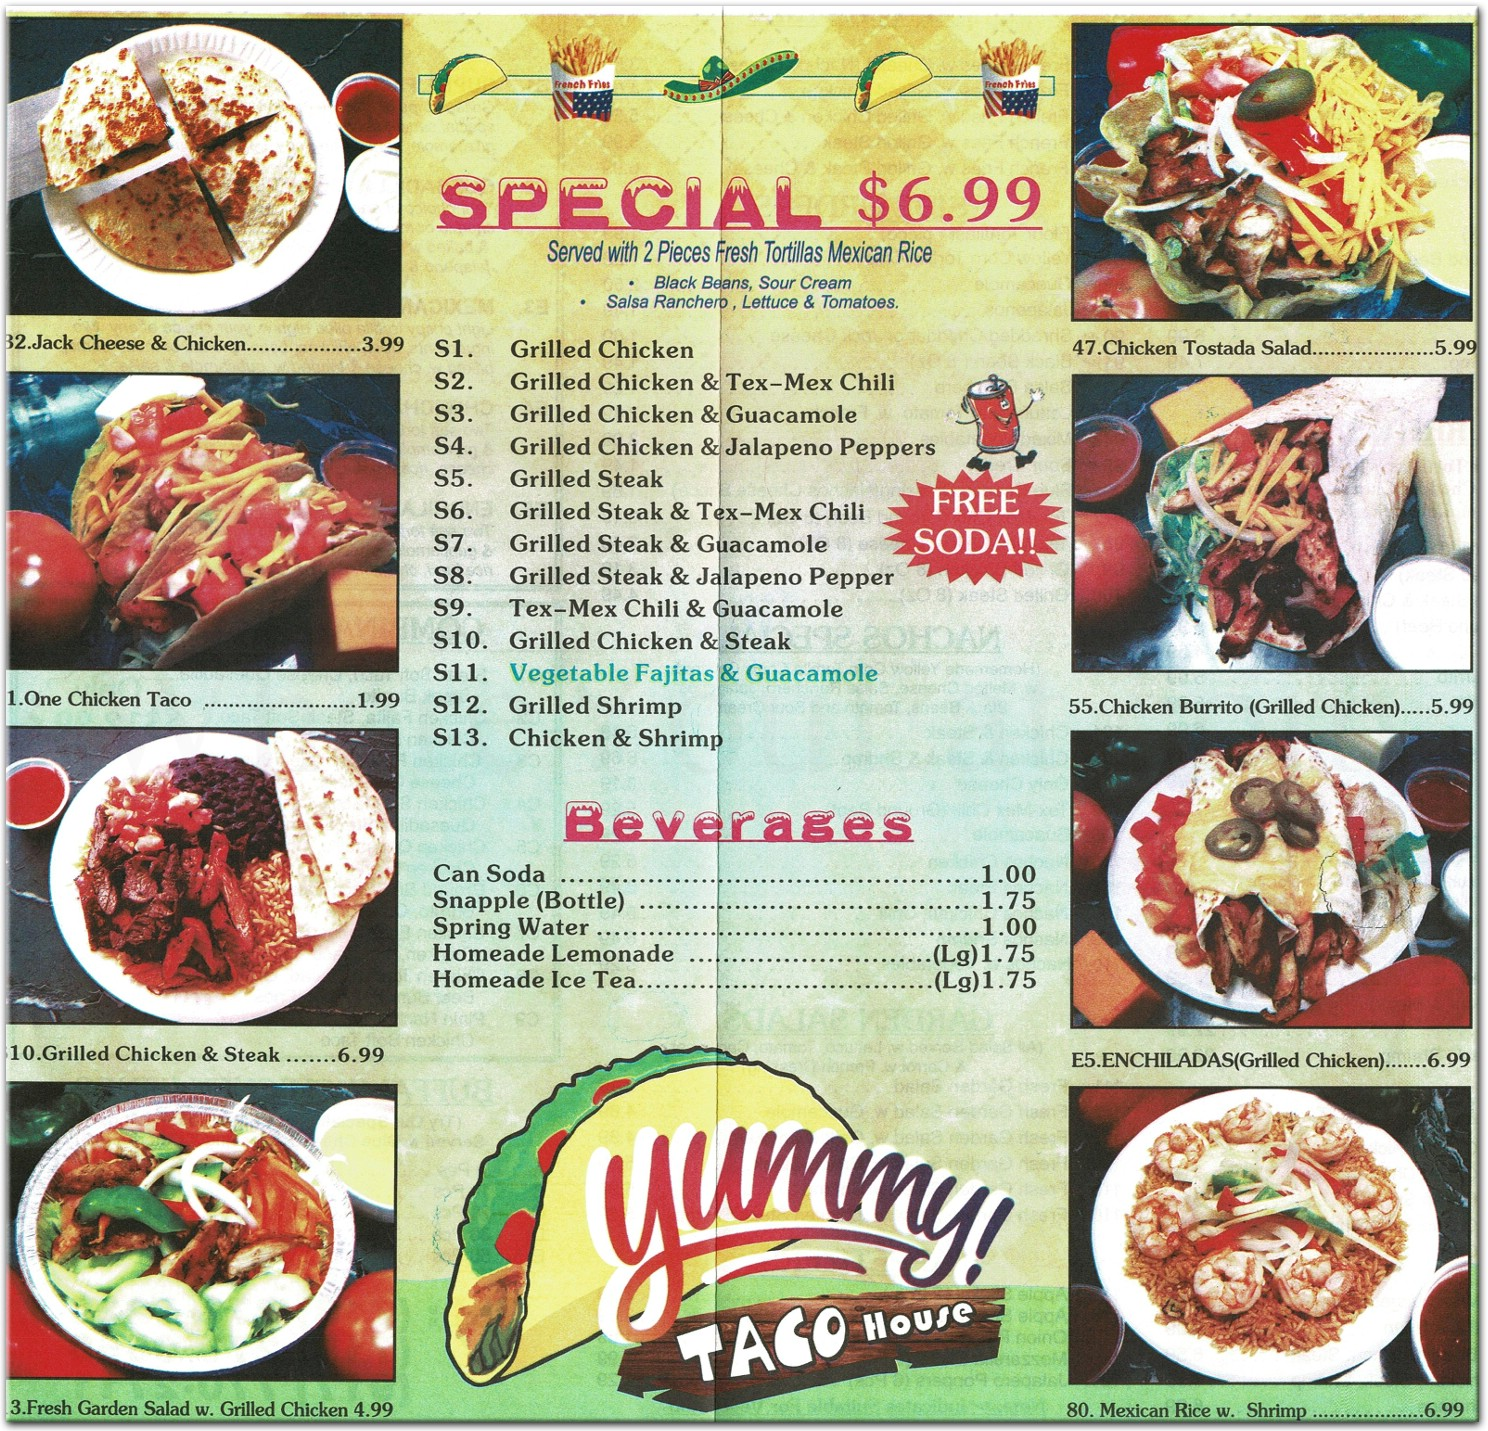 Yummy Taco House Restaurant in Staten Island / Official Menus & Photos